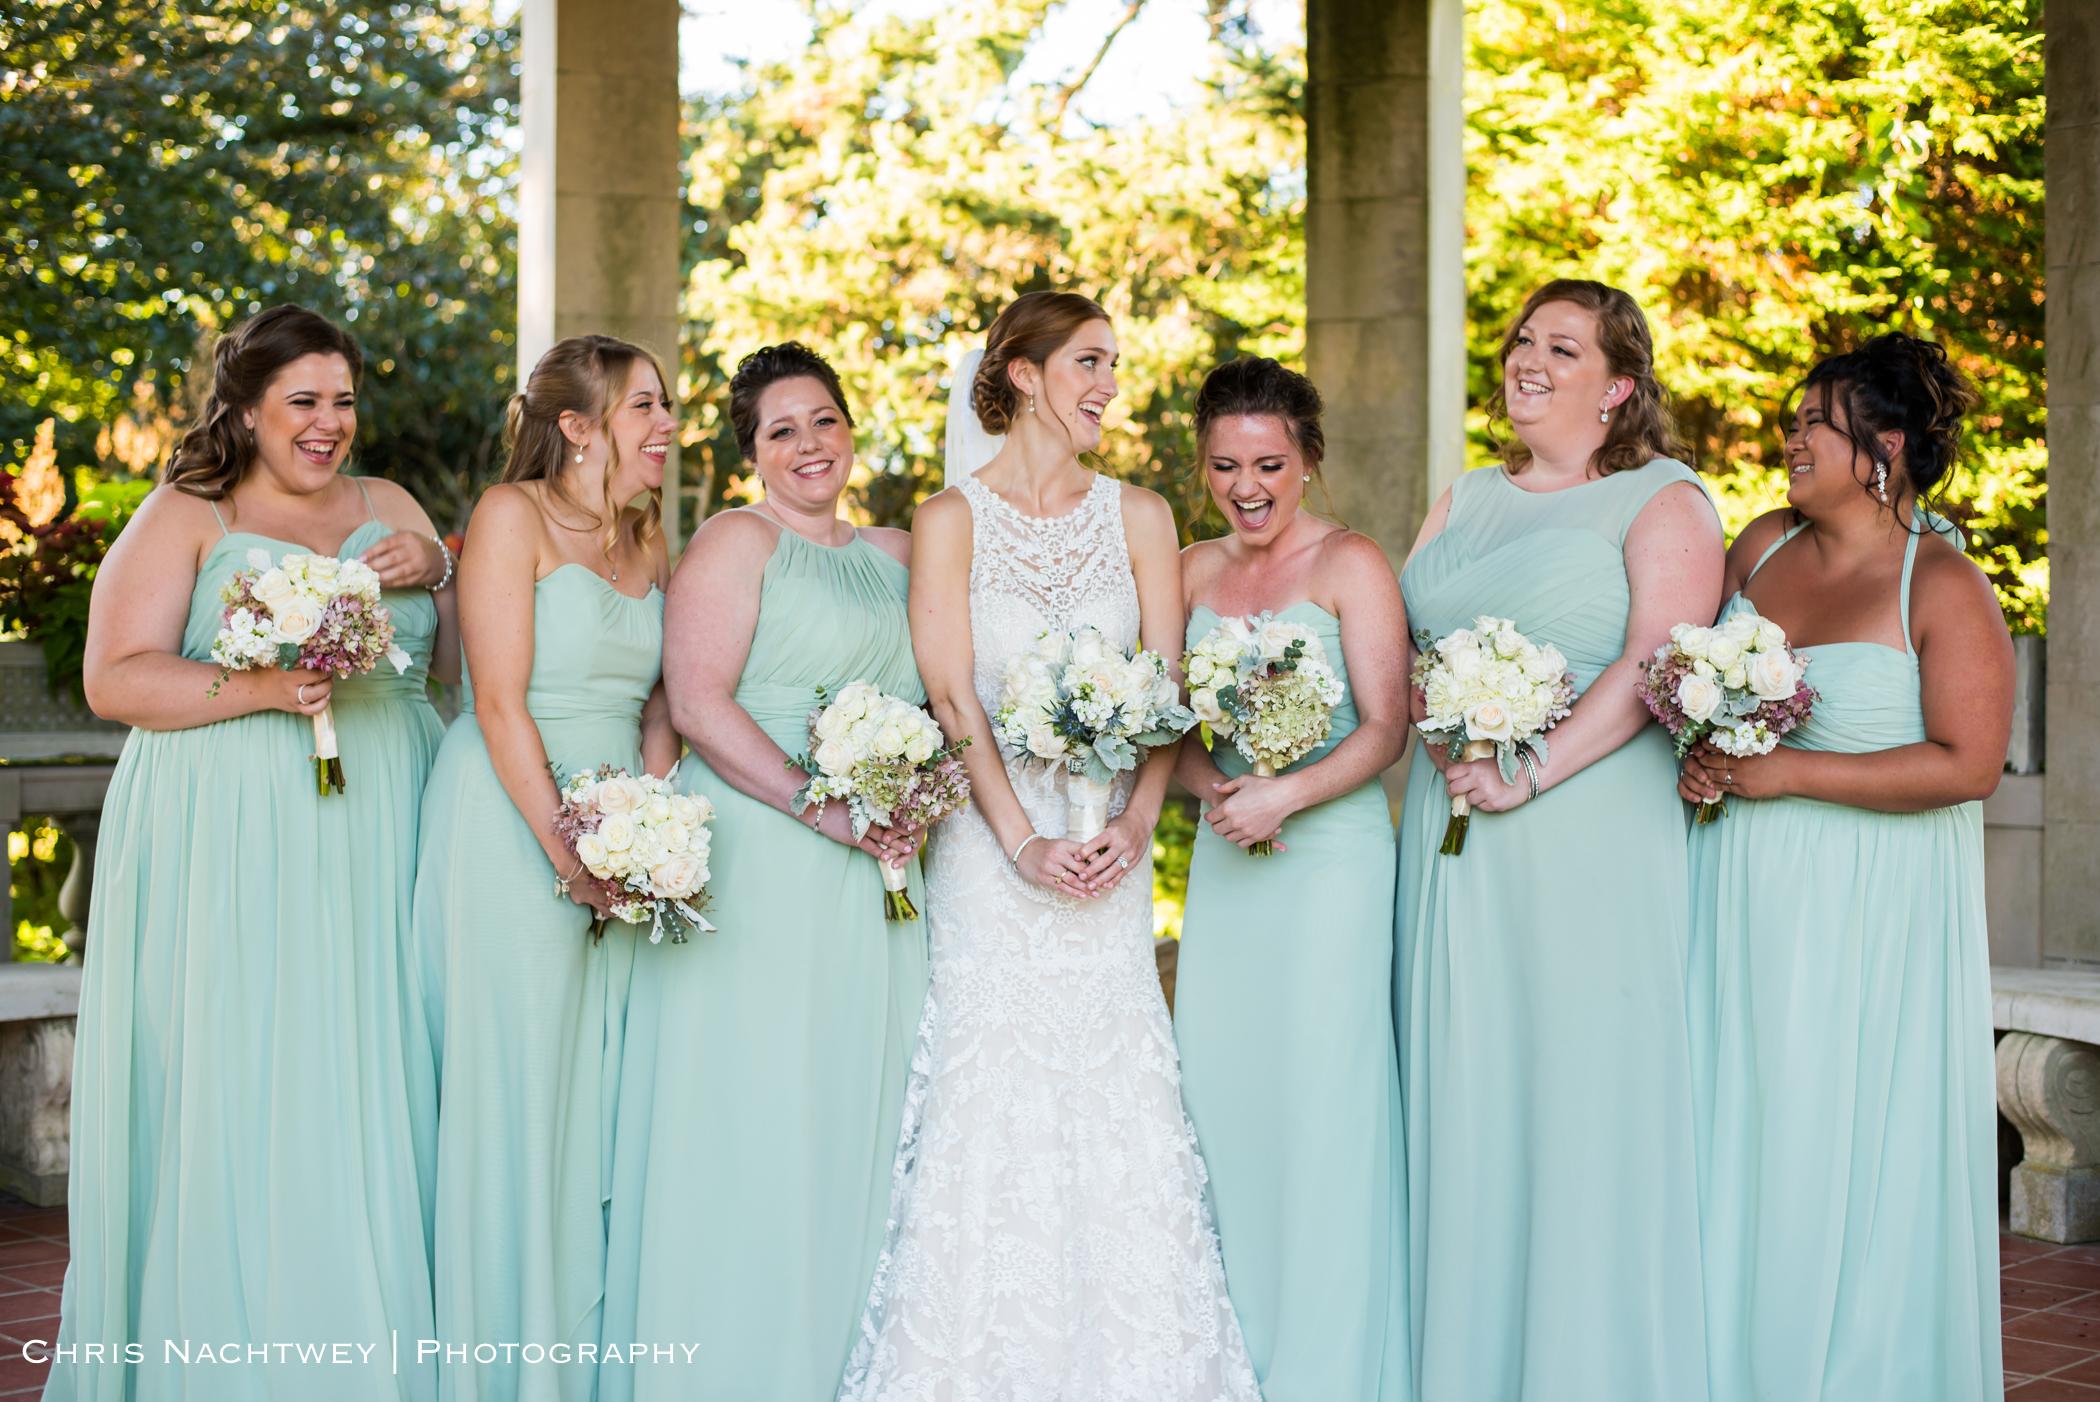 harkness-wedding-photos-chris-nachtwey-photography-2018-17.jpg